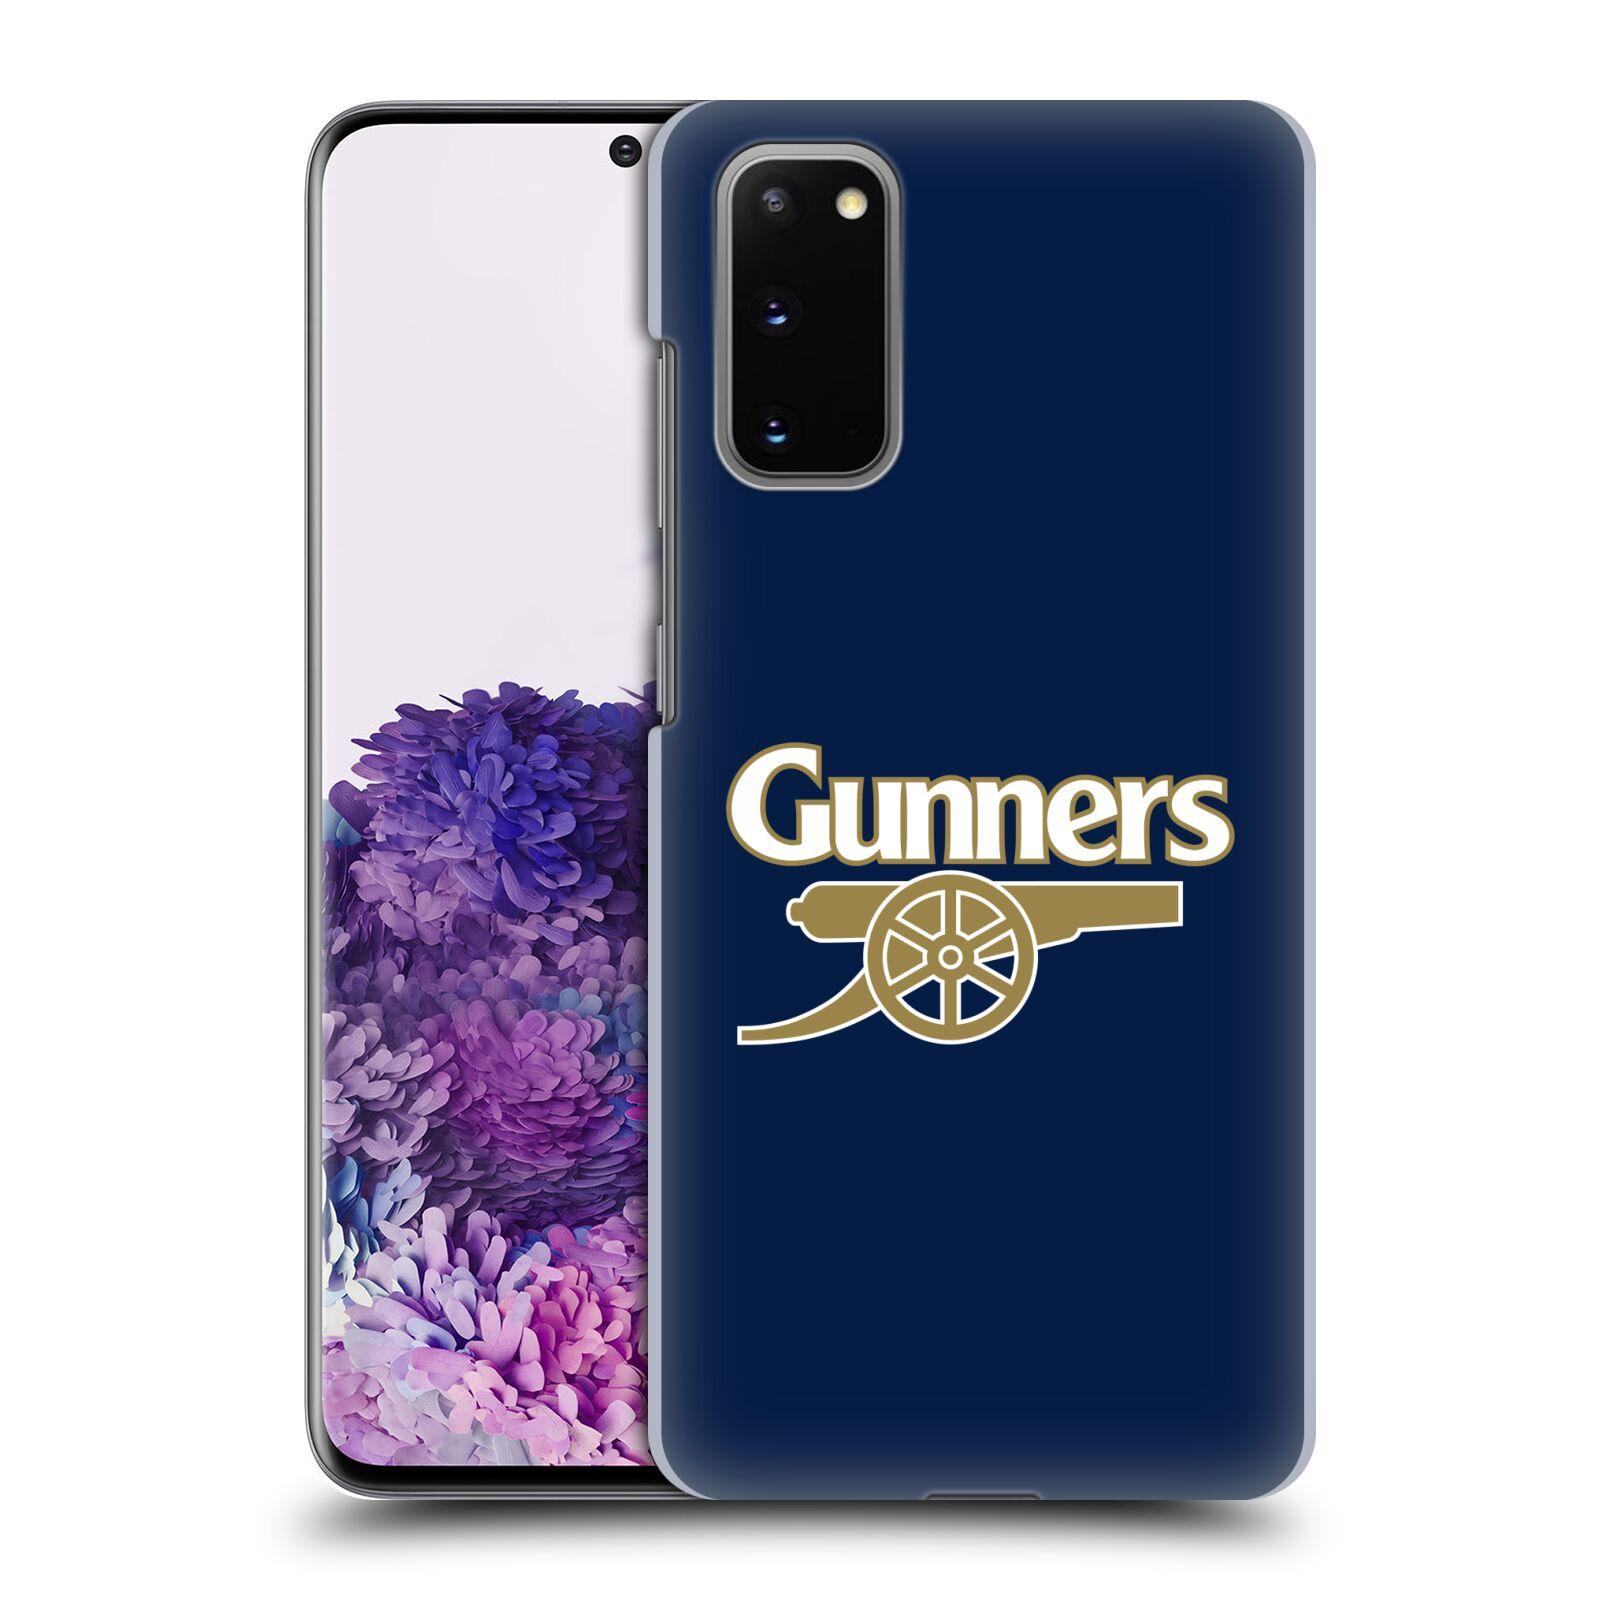 Plastové pouzdro na mobil Samsung Galaxy S20 - Head Case - Arsenal FC - Gunners